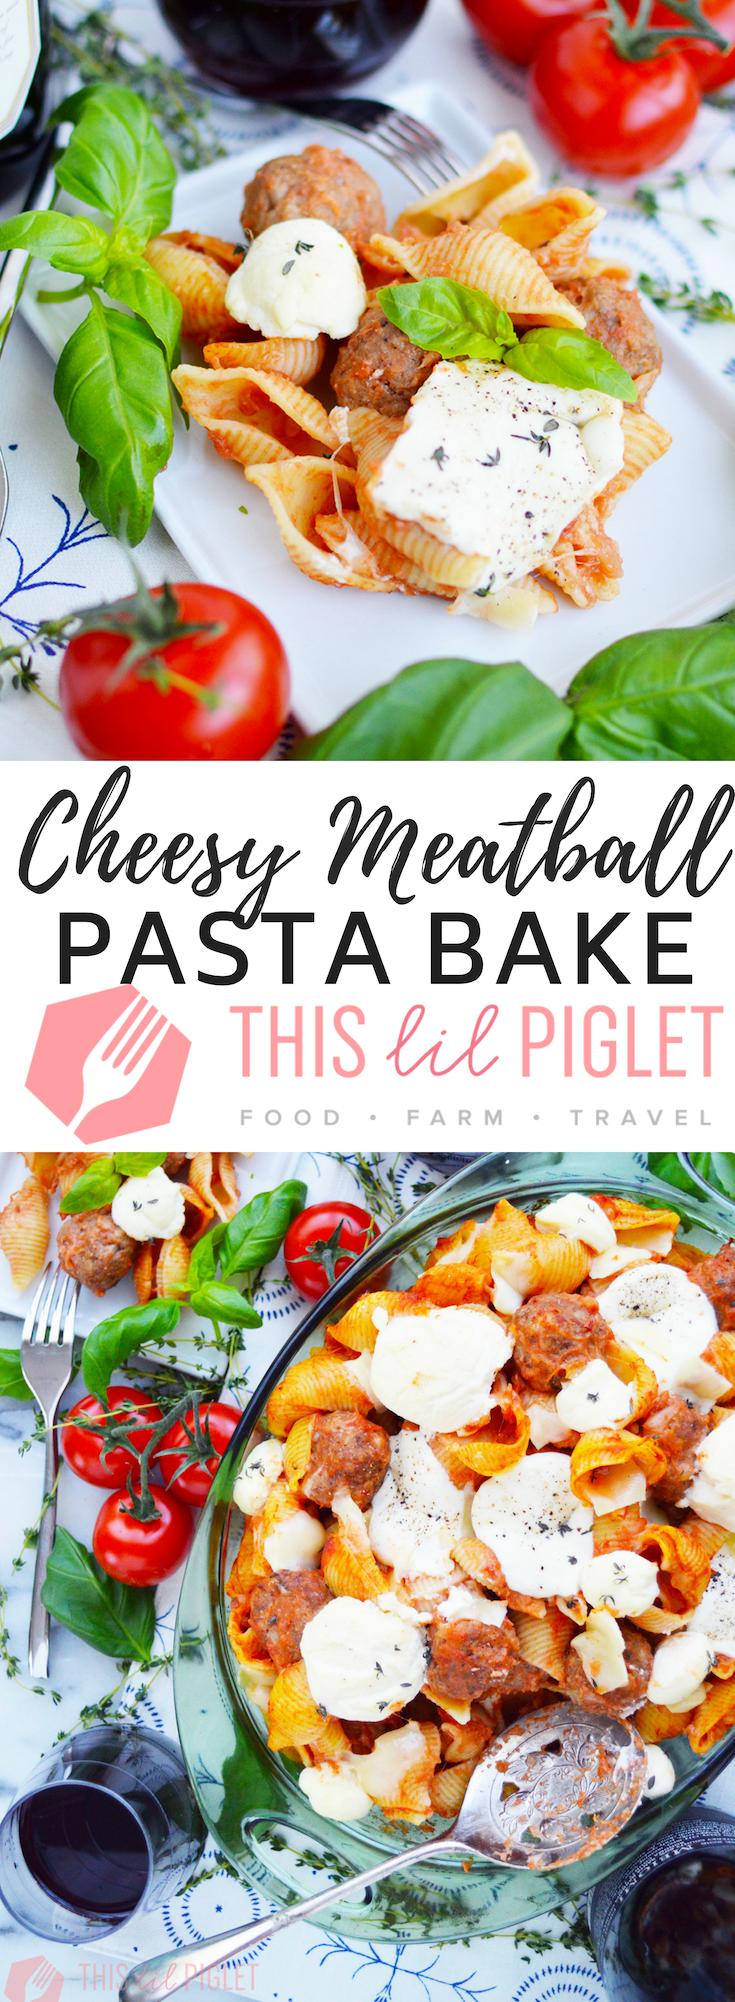 Cheesy Meatball Pasta Bake Casserole // thislilpiglet.net